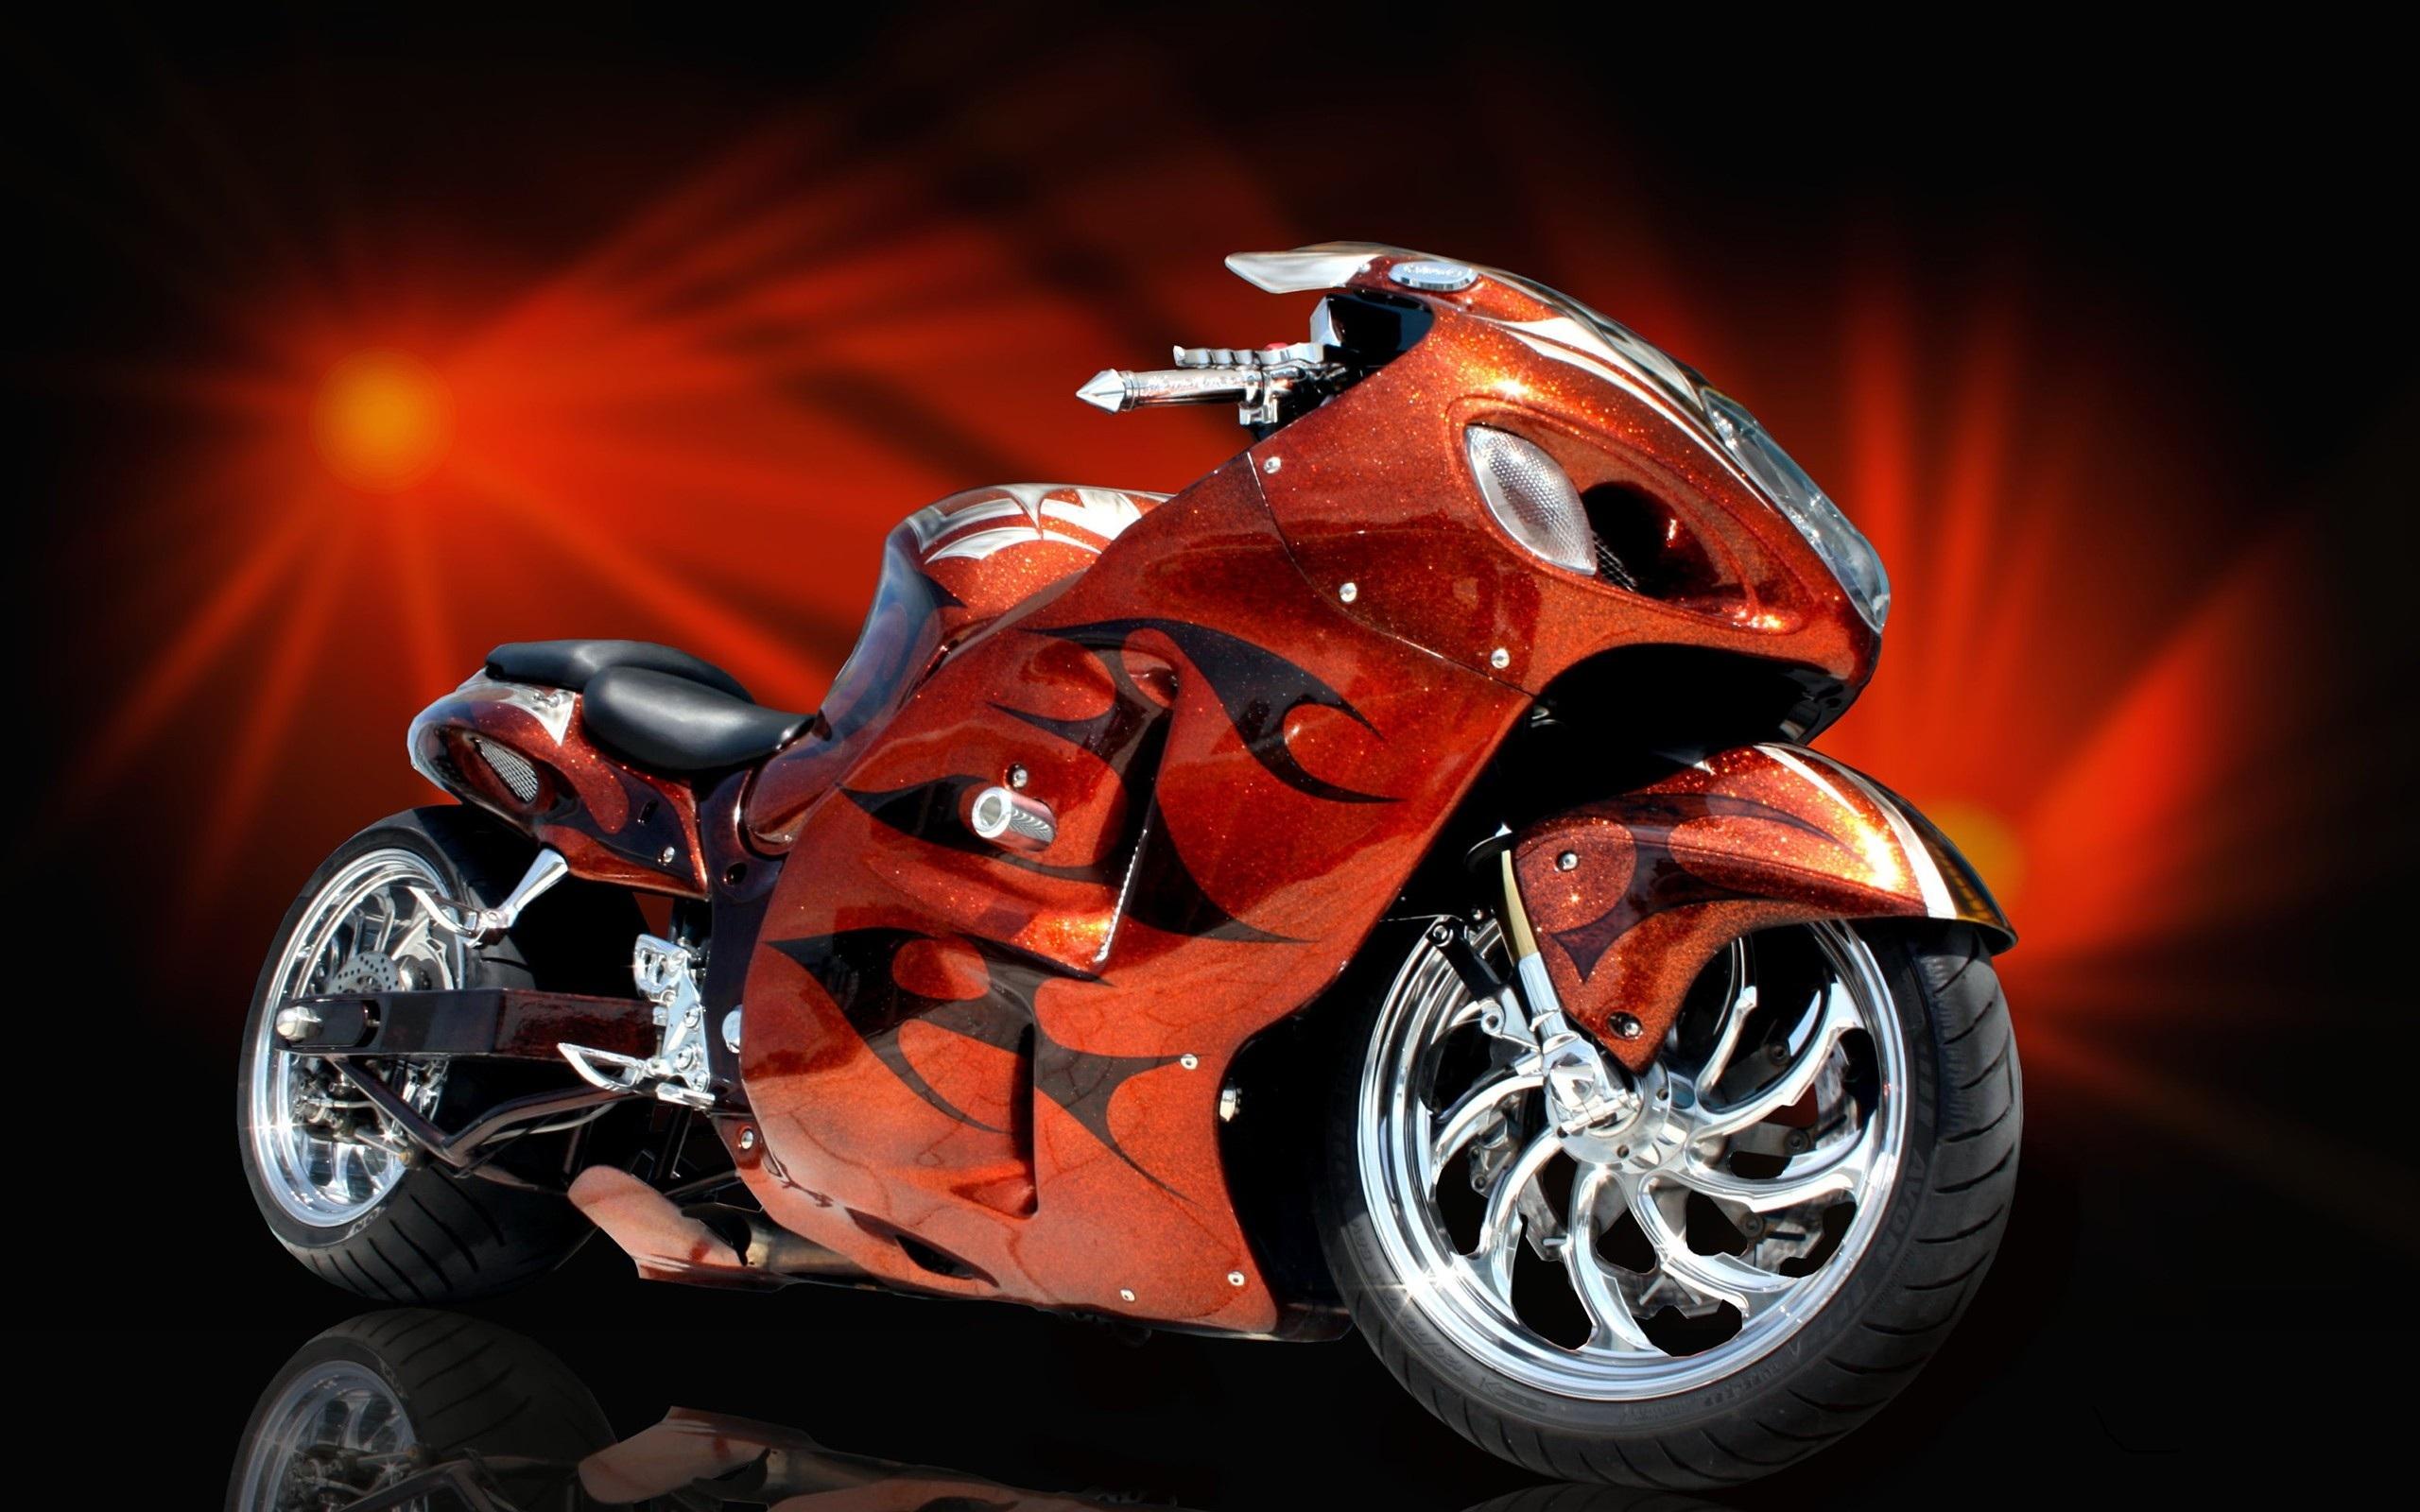 Картинки для телефона мотоциклы